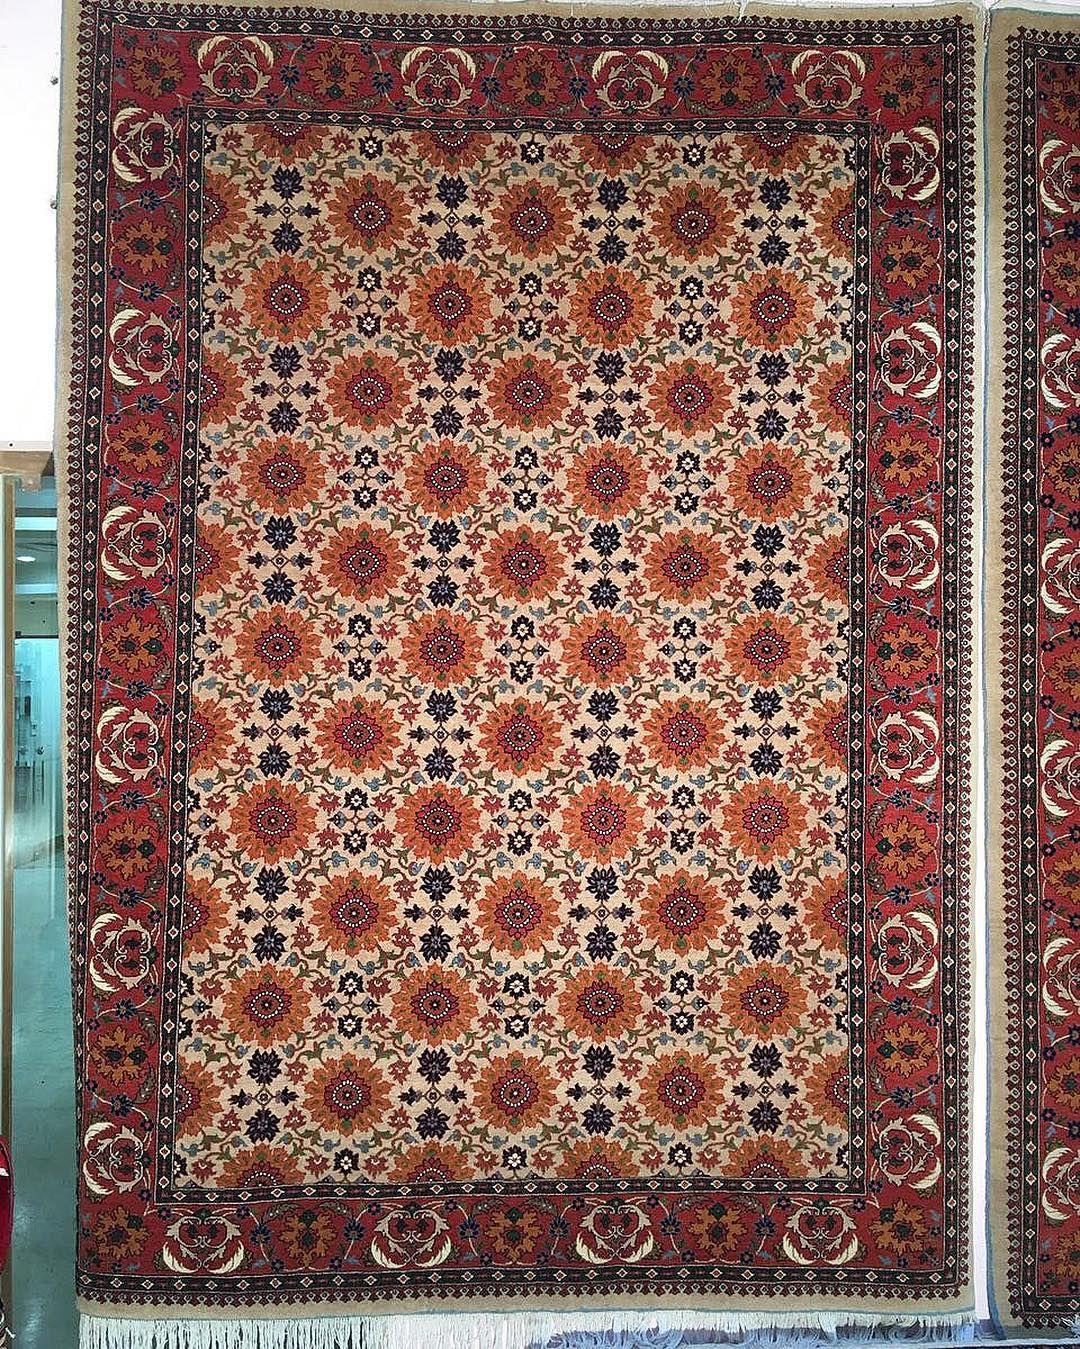 Silk Carpet World Address Silk Carpet World D 12 213 Rohini Sector 7 New Delhi Whatsapp 919355336661 Silkcarpetwor Carpet World Silk Carpet Carpet